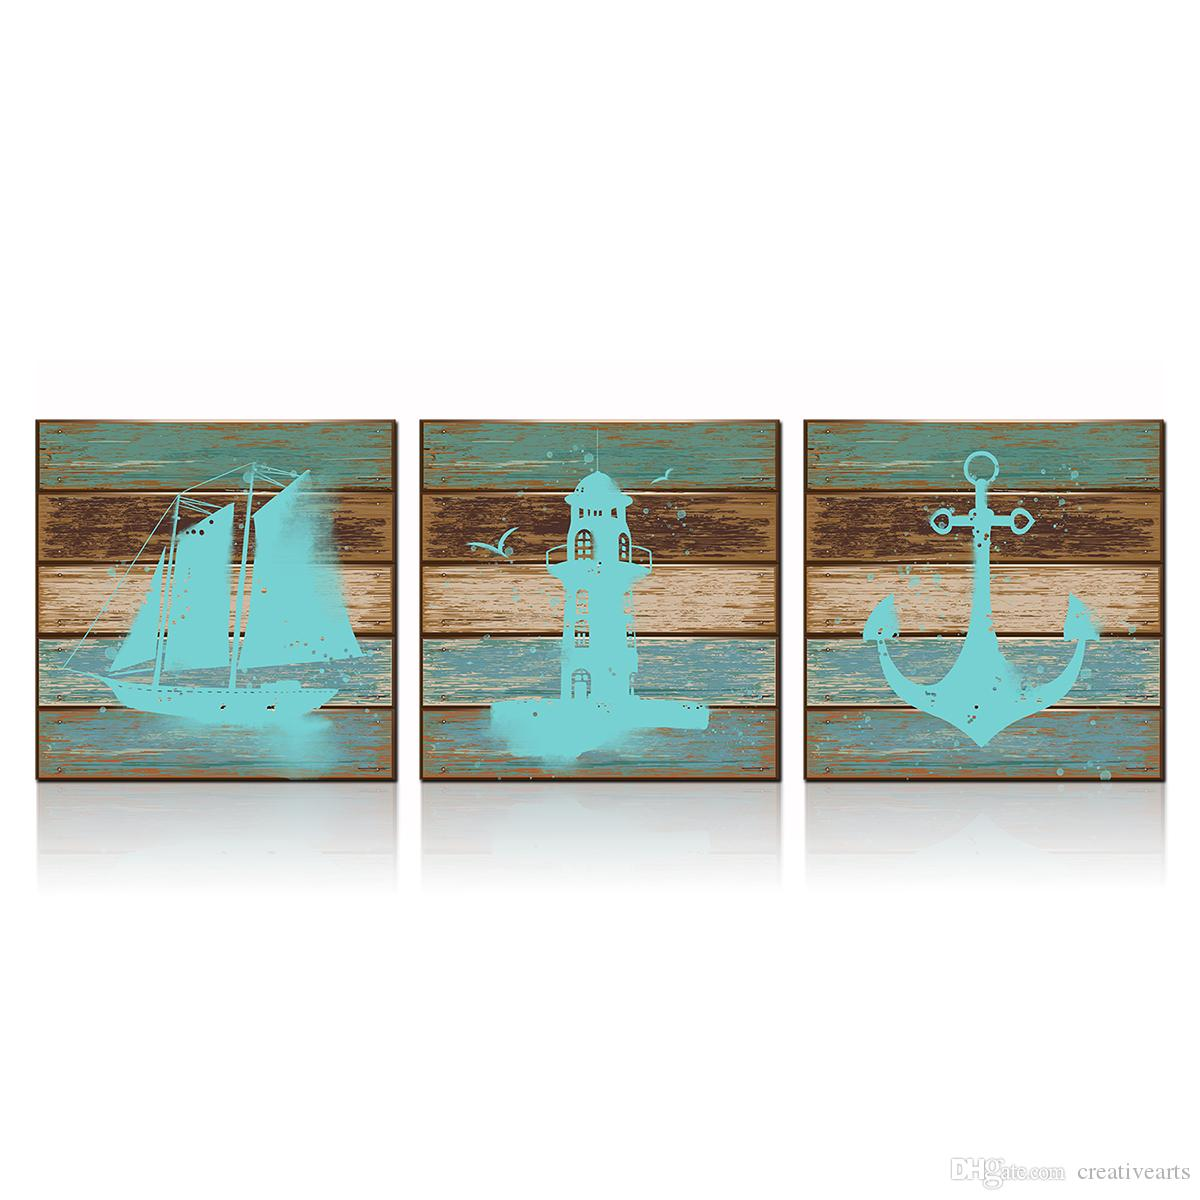 3 Piece Seascape Canvas Wall Art Lighthouse Anchor Sailingboat Pictures For Bathroom Decor 12 X12 X3pcs